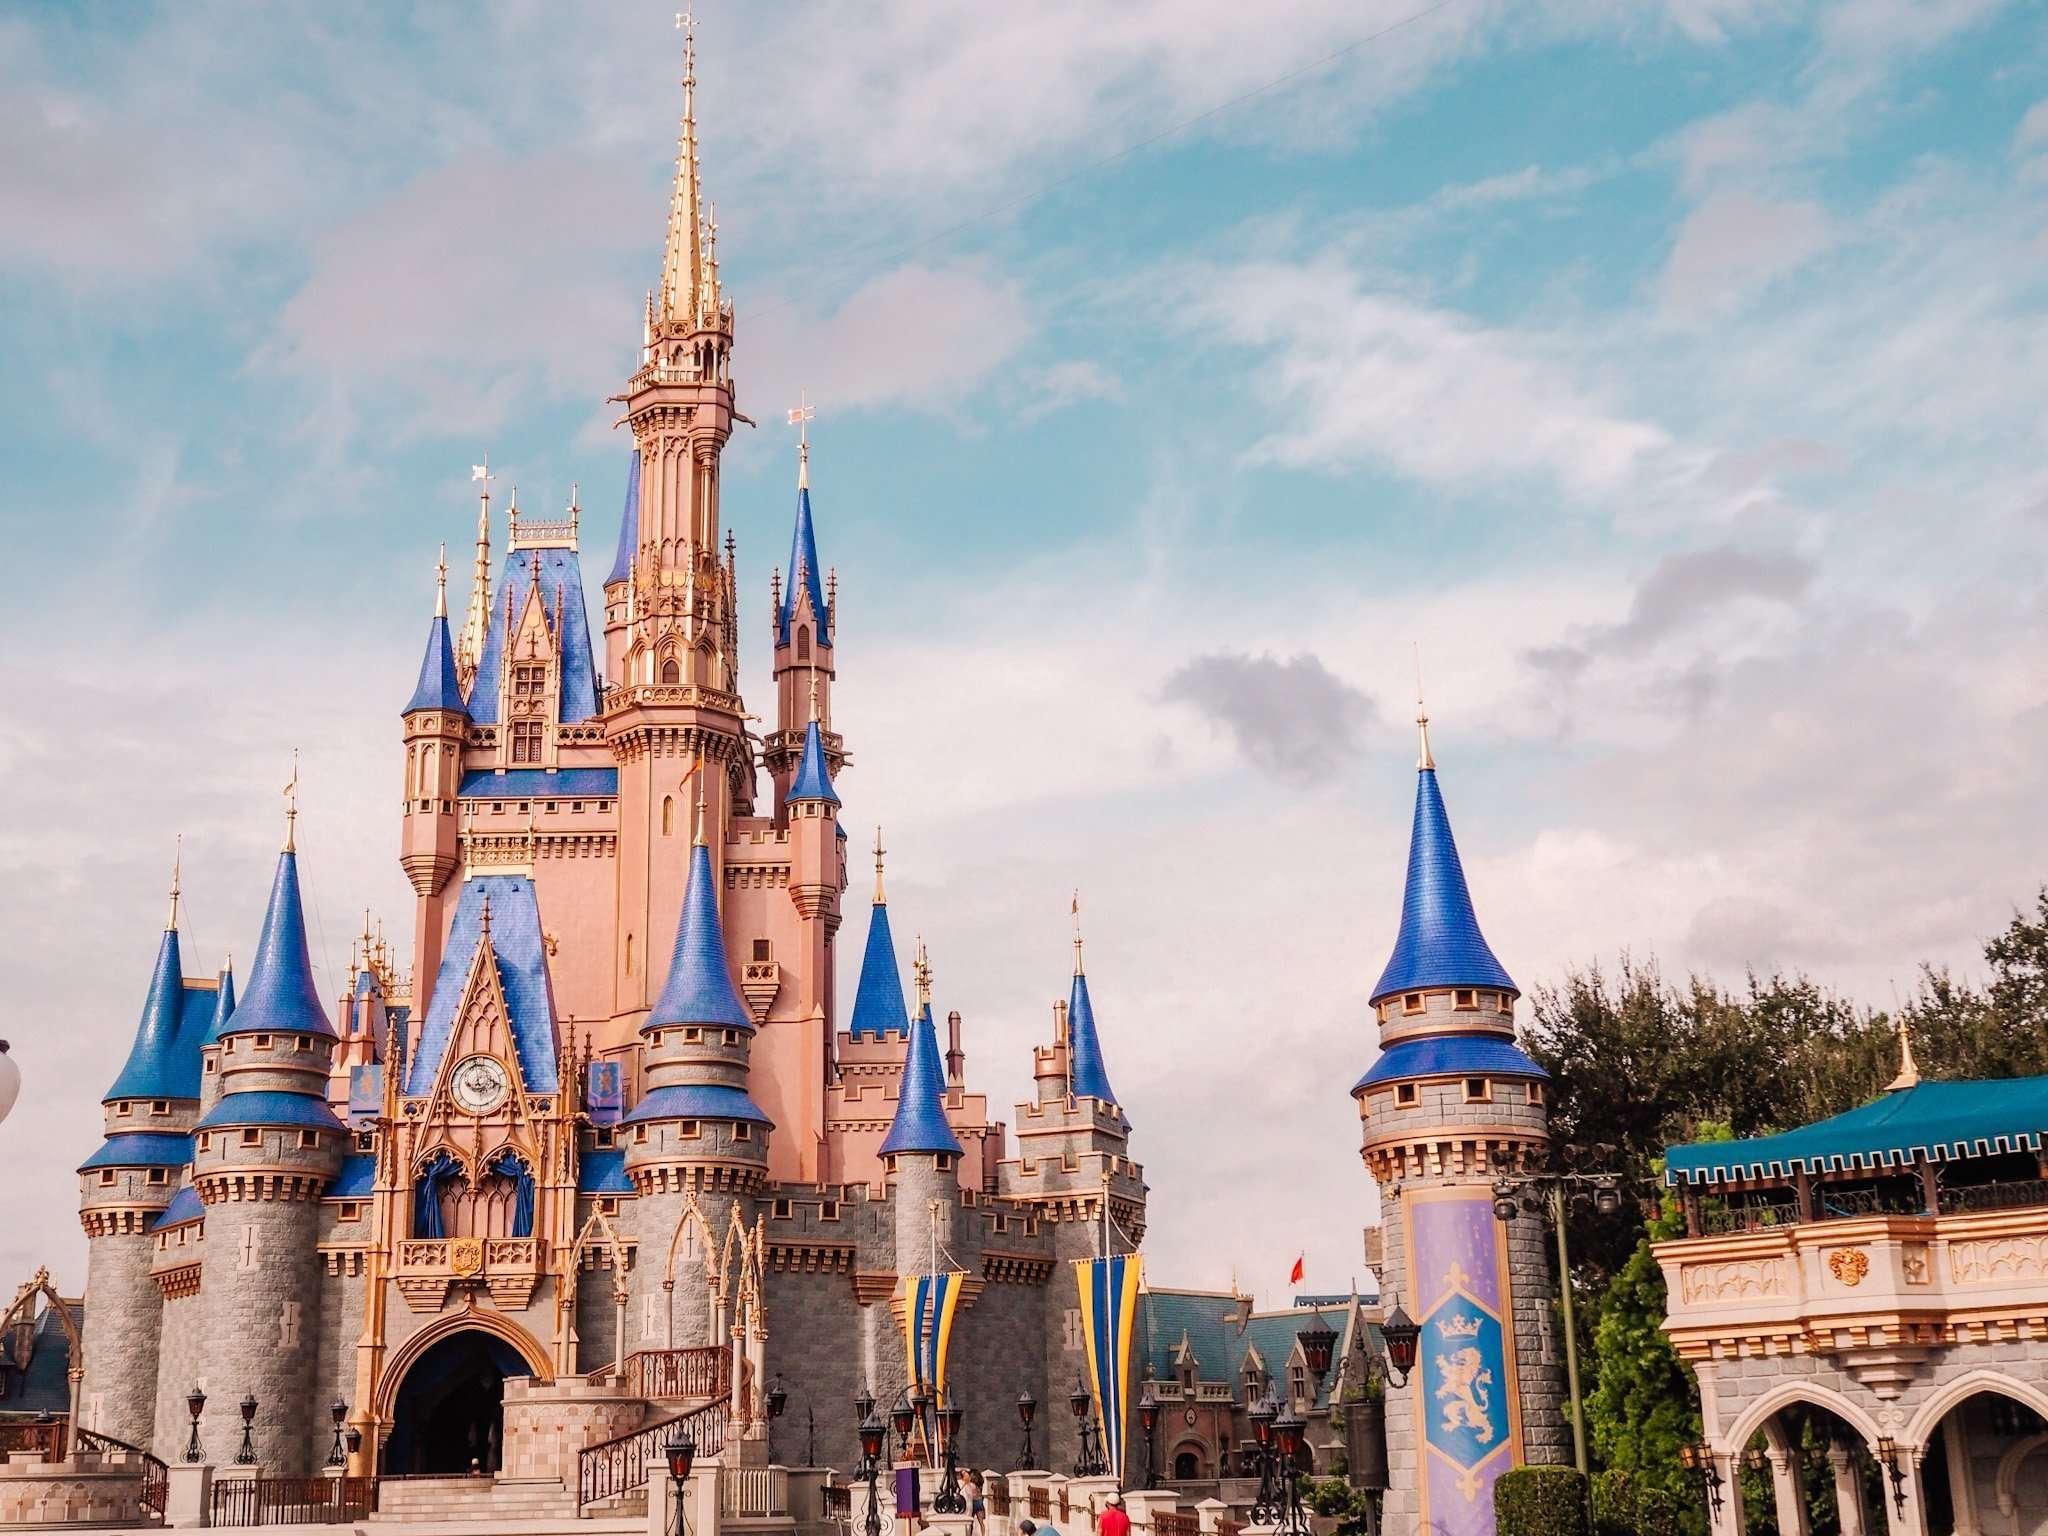 Planning a Walt Disney World Vacation in 2022